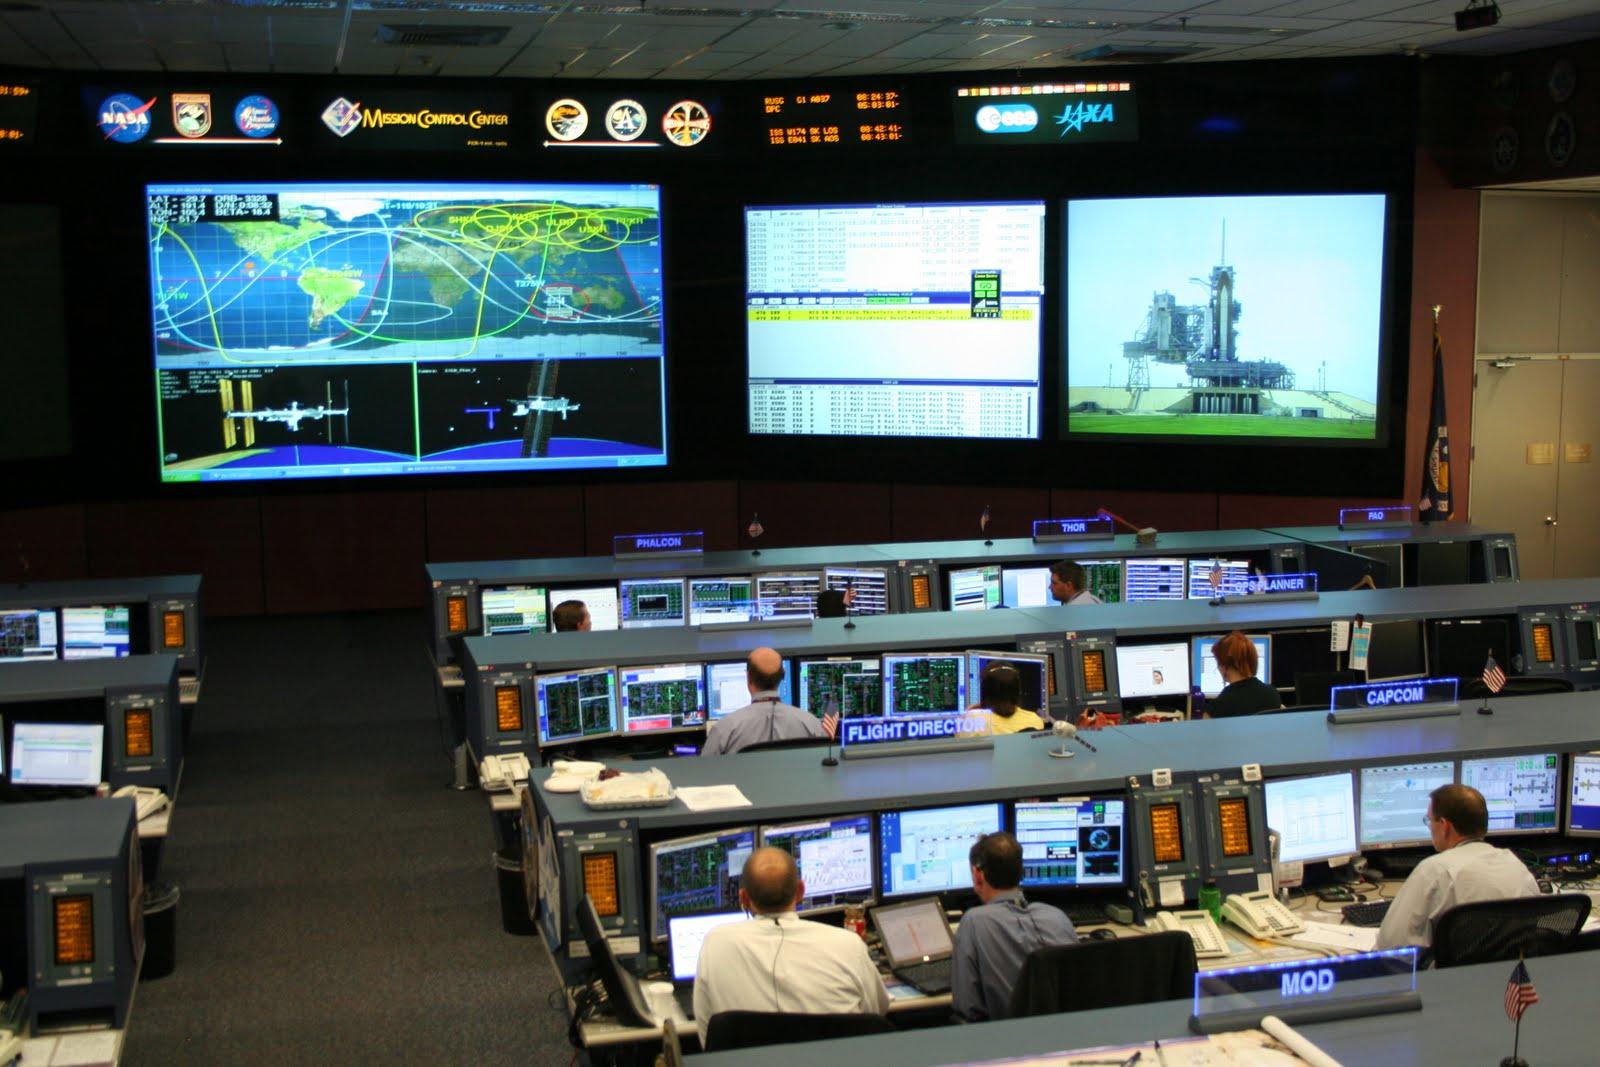 nasa space controls - photo #15